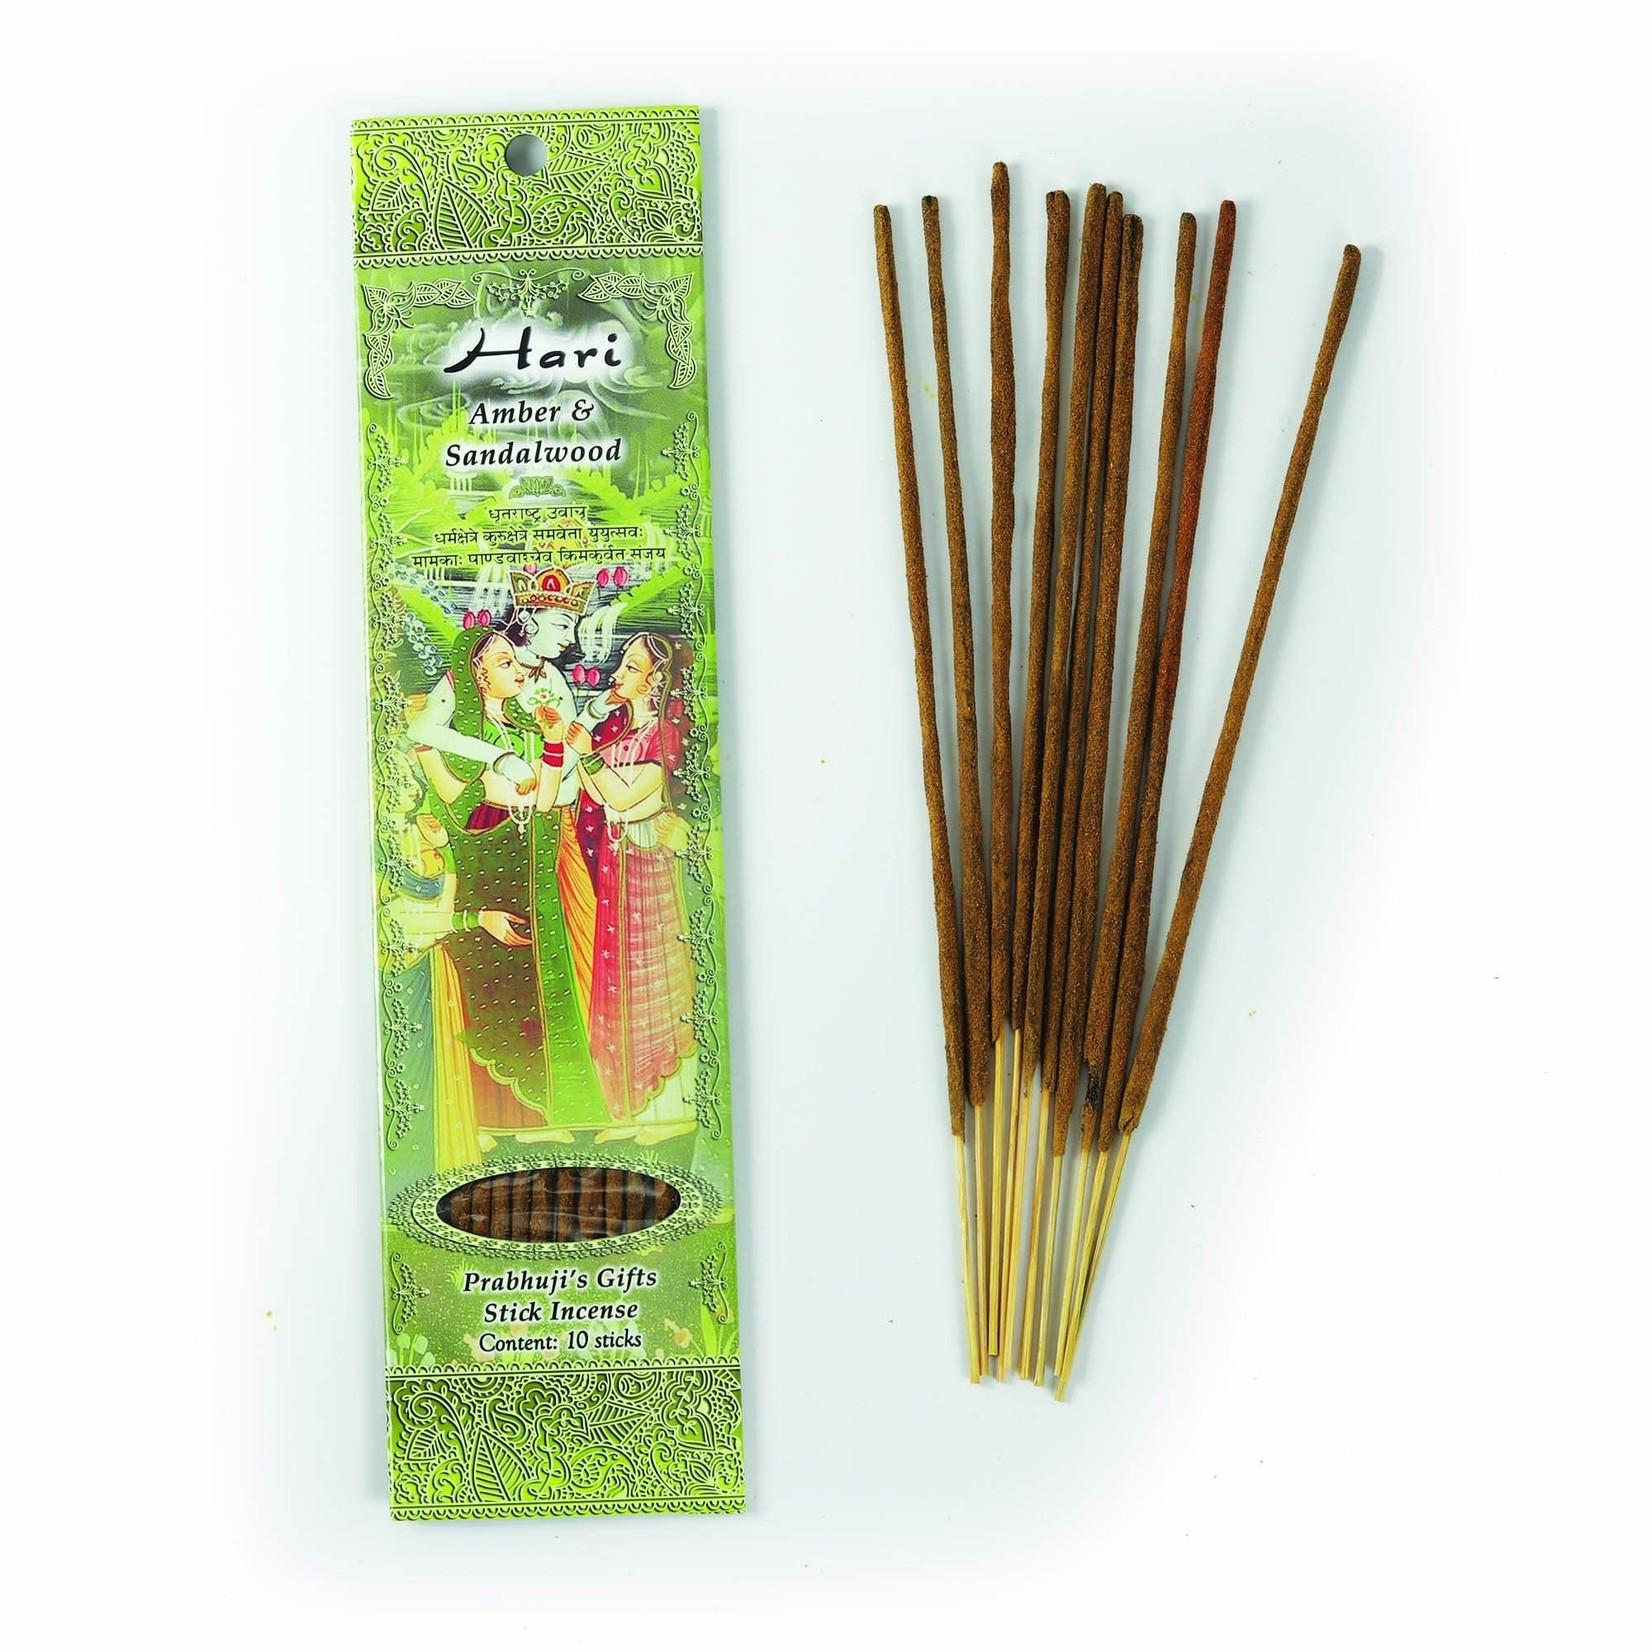 Prabhujis Gifts Hari - Amber and Sandalwood Incense Sticks